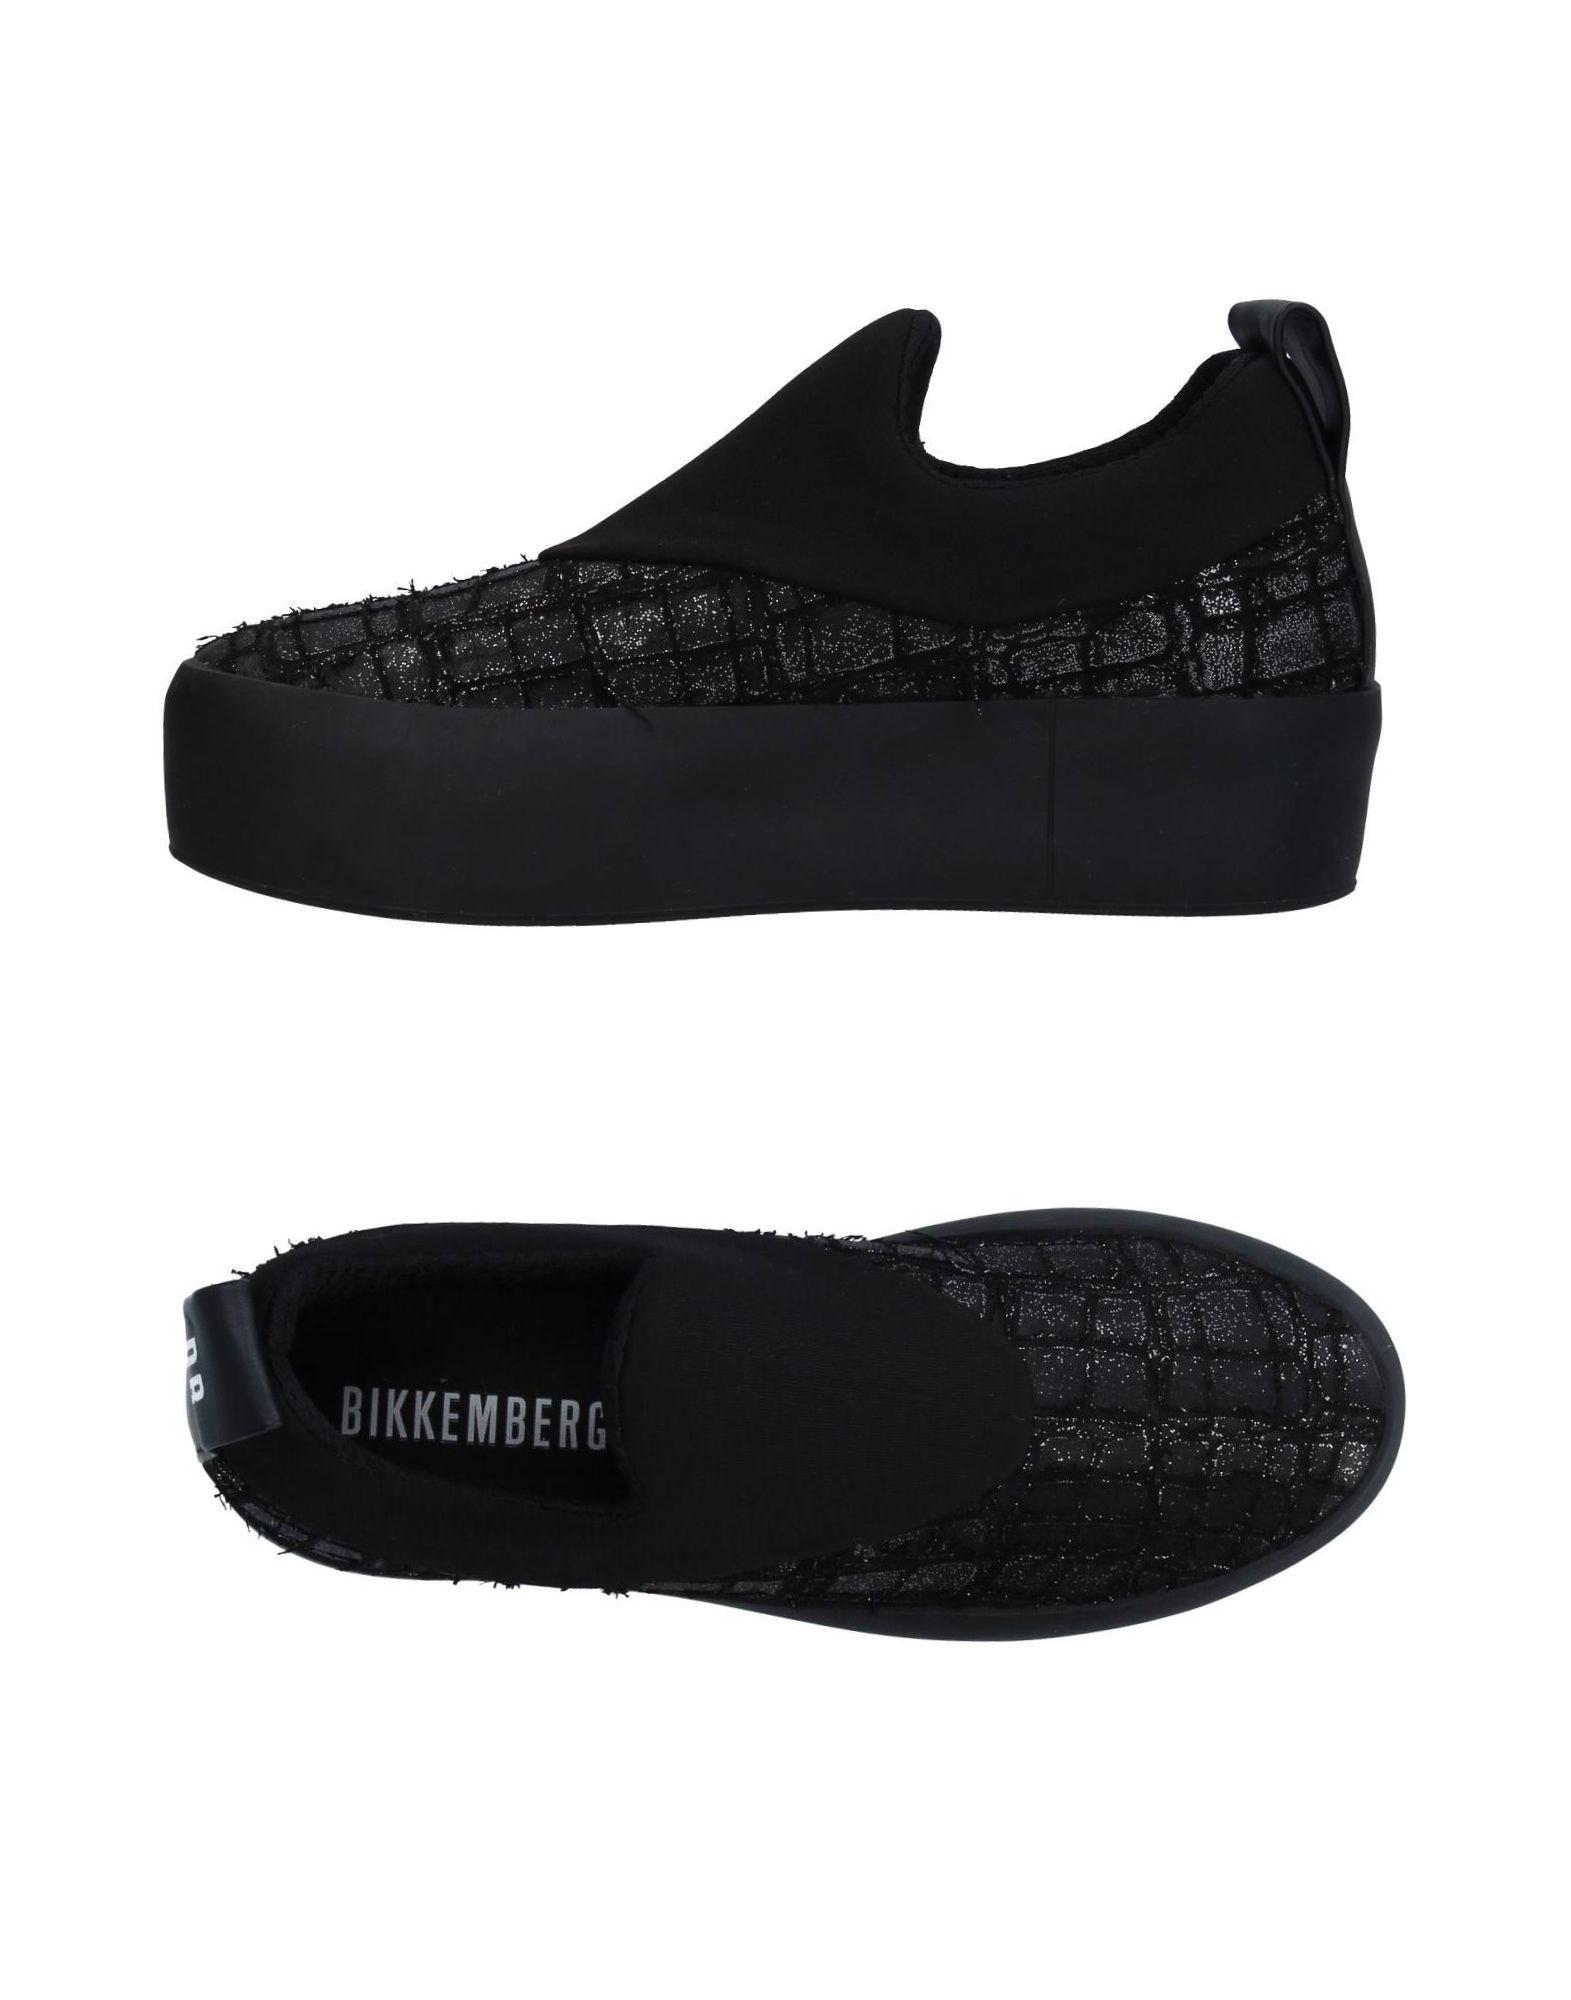 Baskets pas Bikkembergs Femme - Baskets Bikkembergs Noir Chaussures femme pas Baskets cher homme et femme b9e836